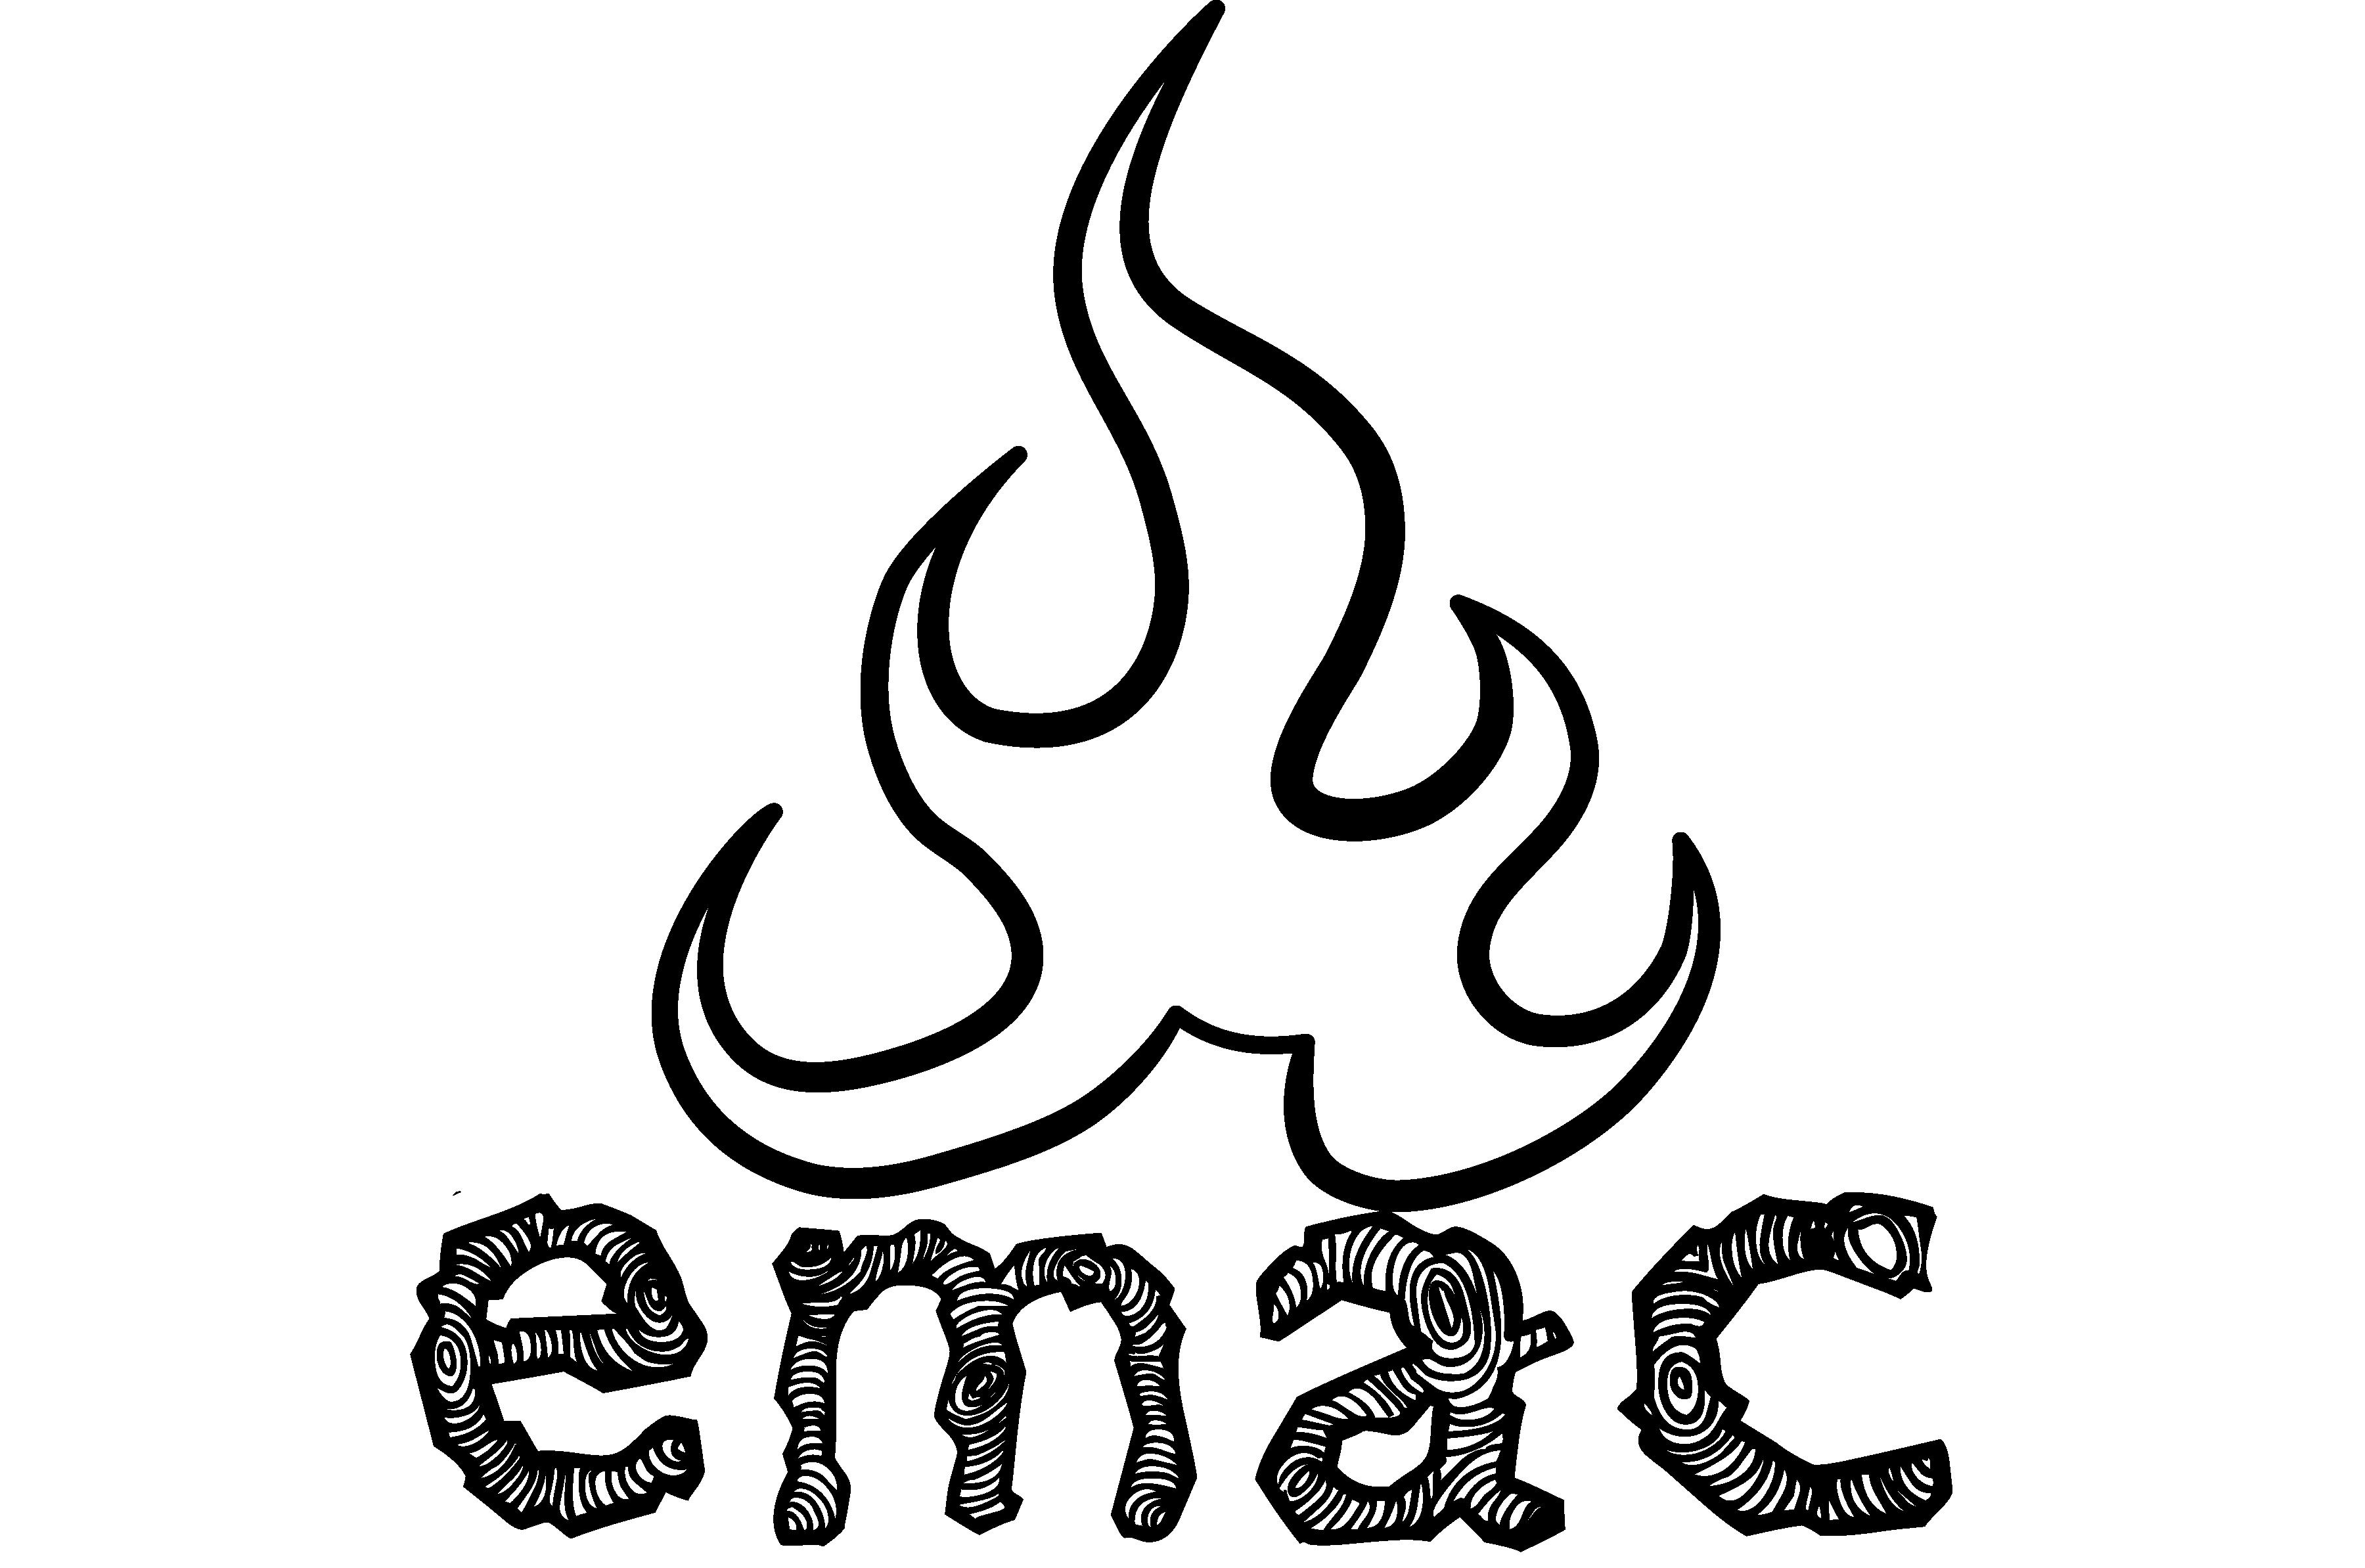 7796a8ec-c308-4571-bdb4-7b4dad32dbe8